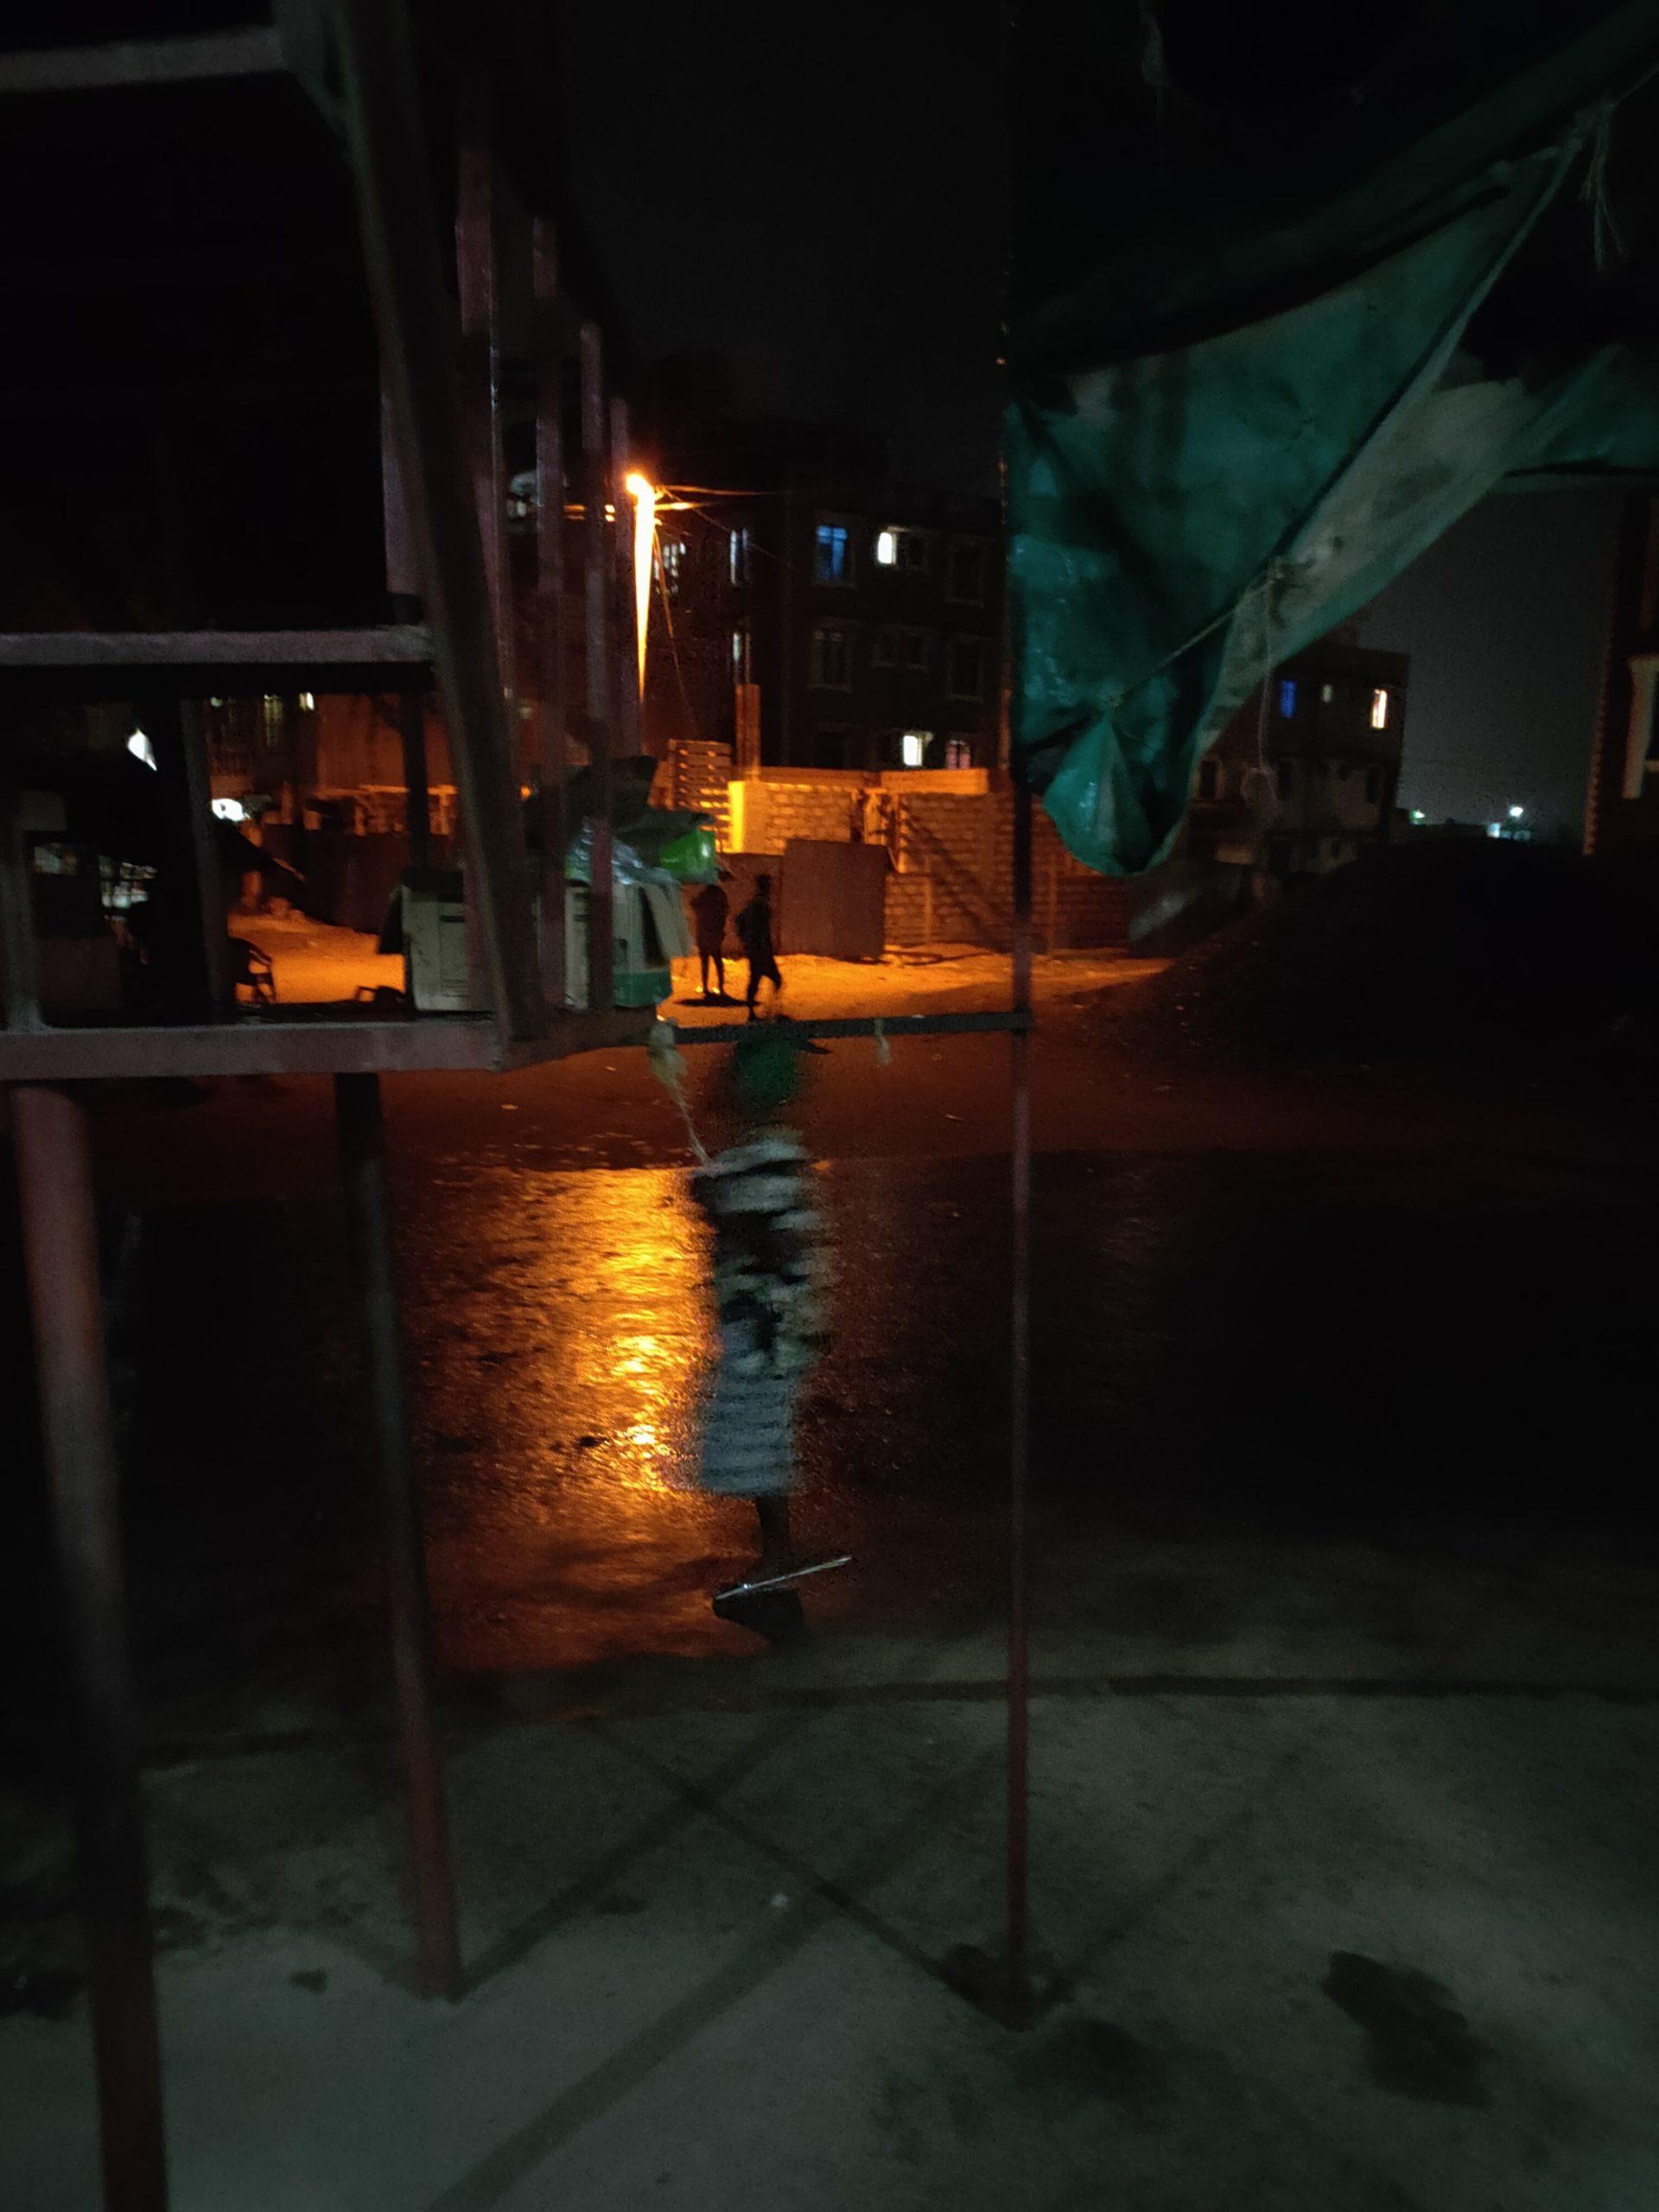 Devuvuzelator